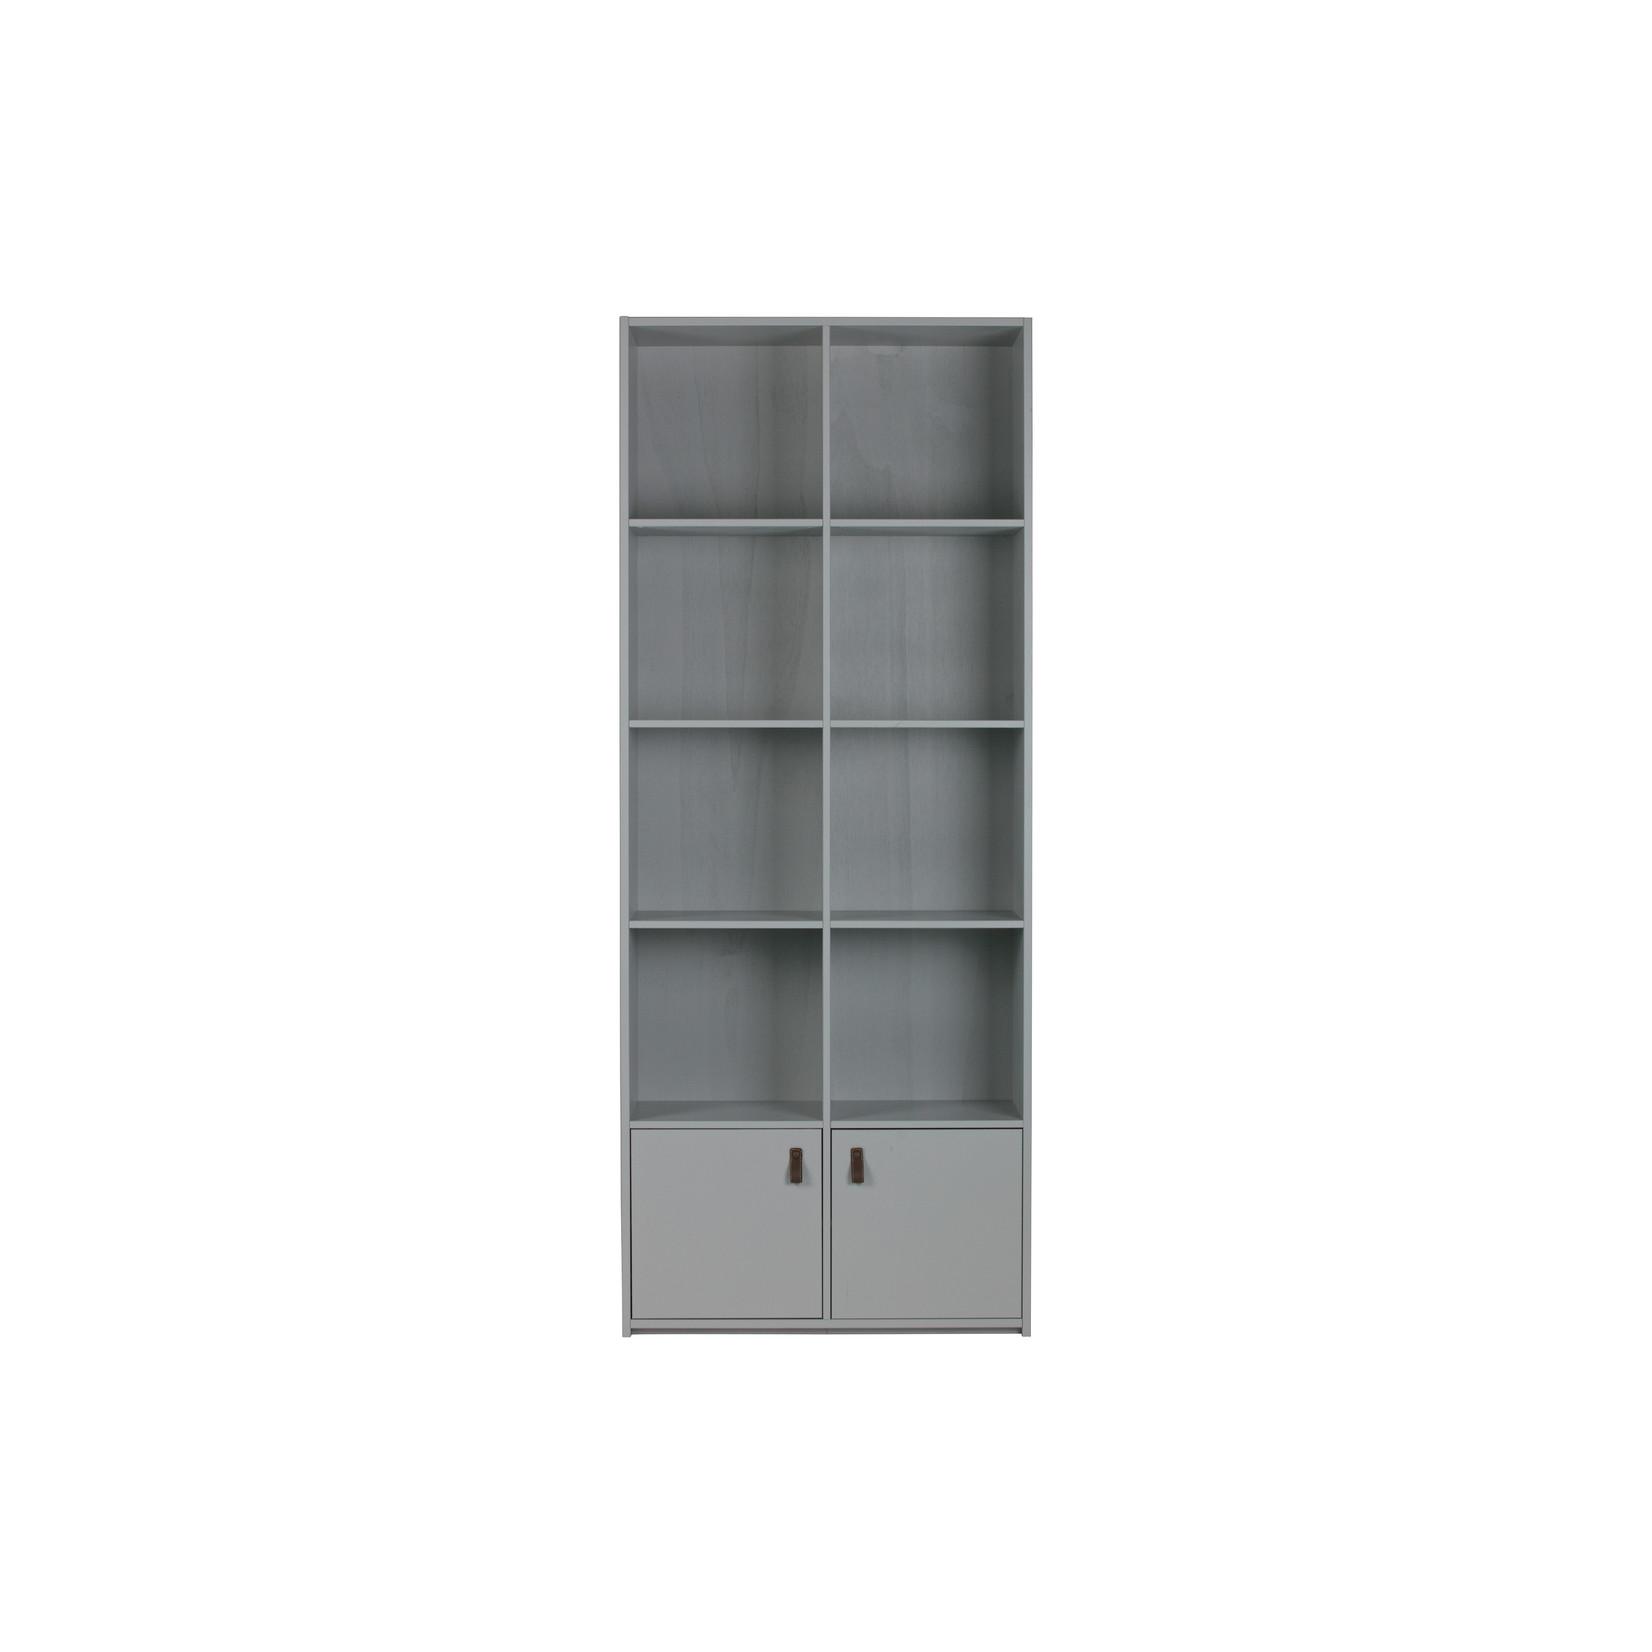 vtwonen Bookcase Grenen Betongrijs [fsc]